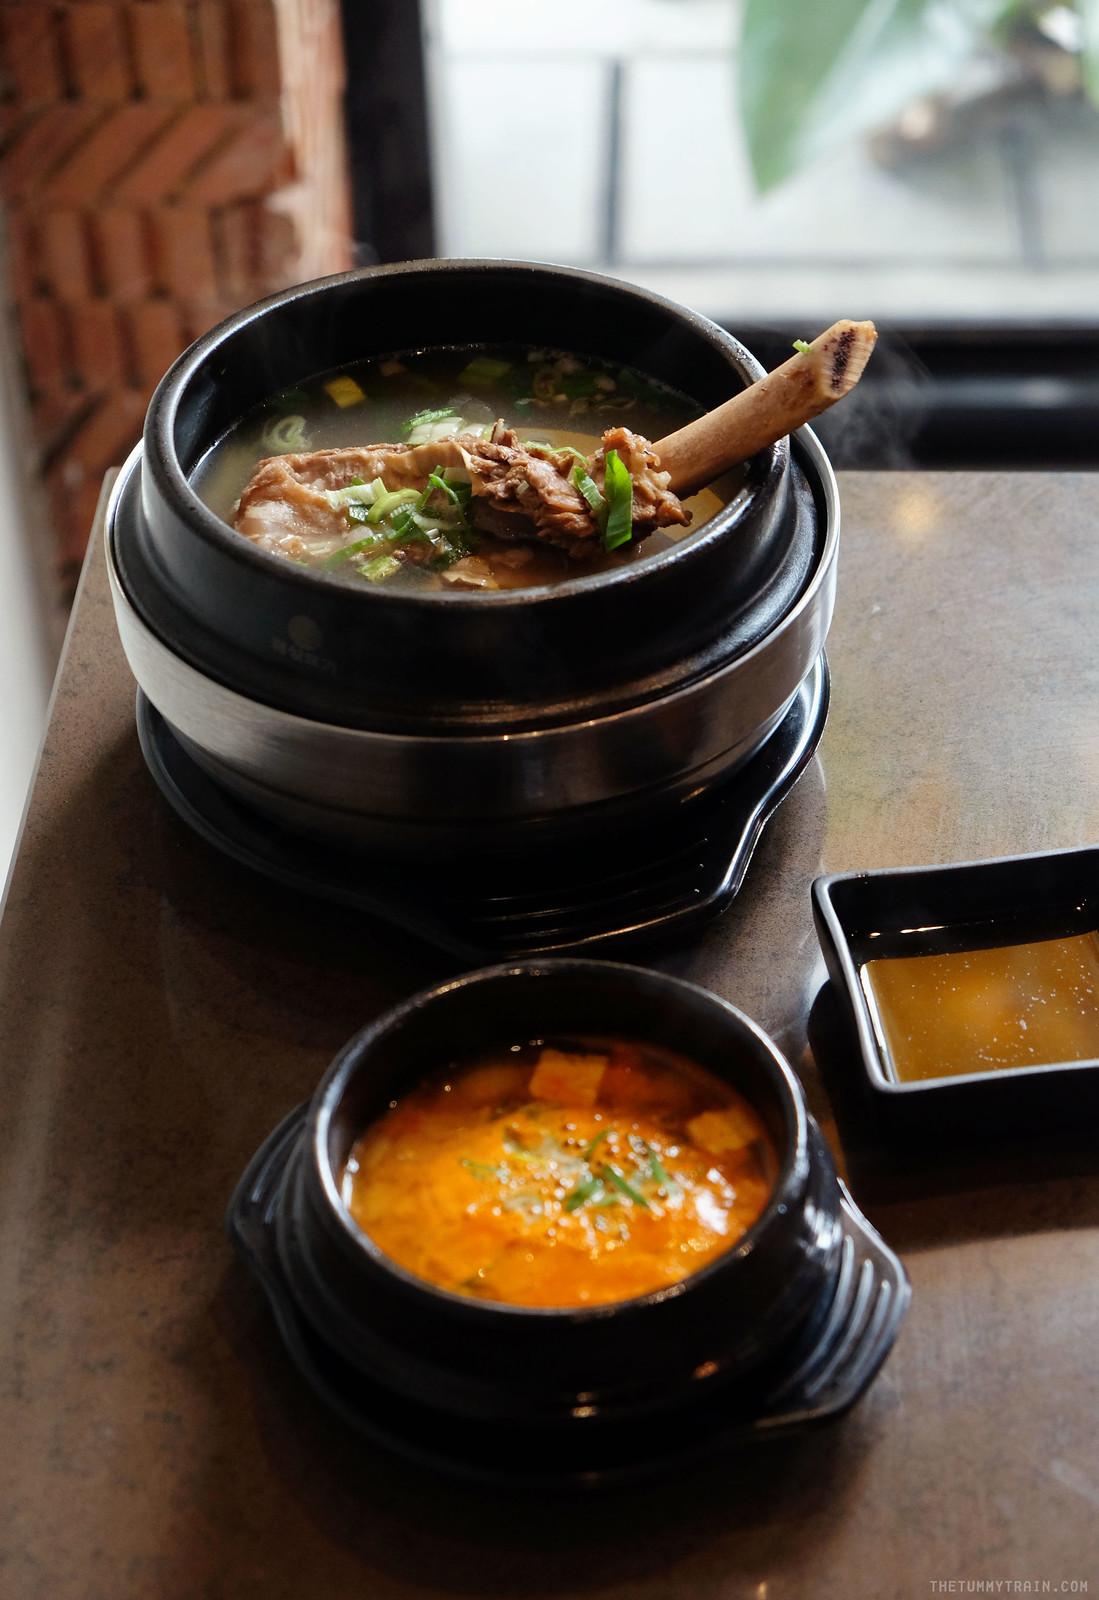 28930622895 cd11783147 h - Getting a premium Korean BBQ experience at Namoo House